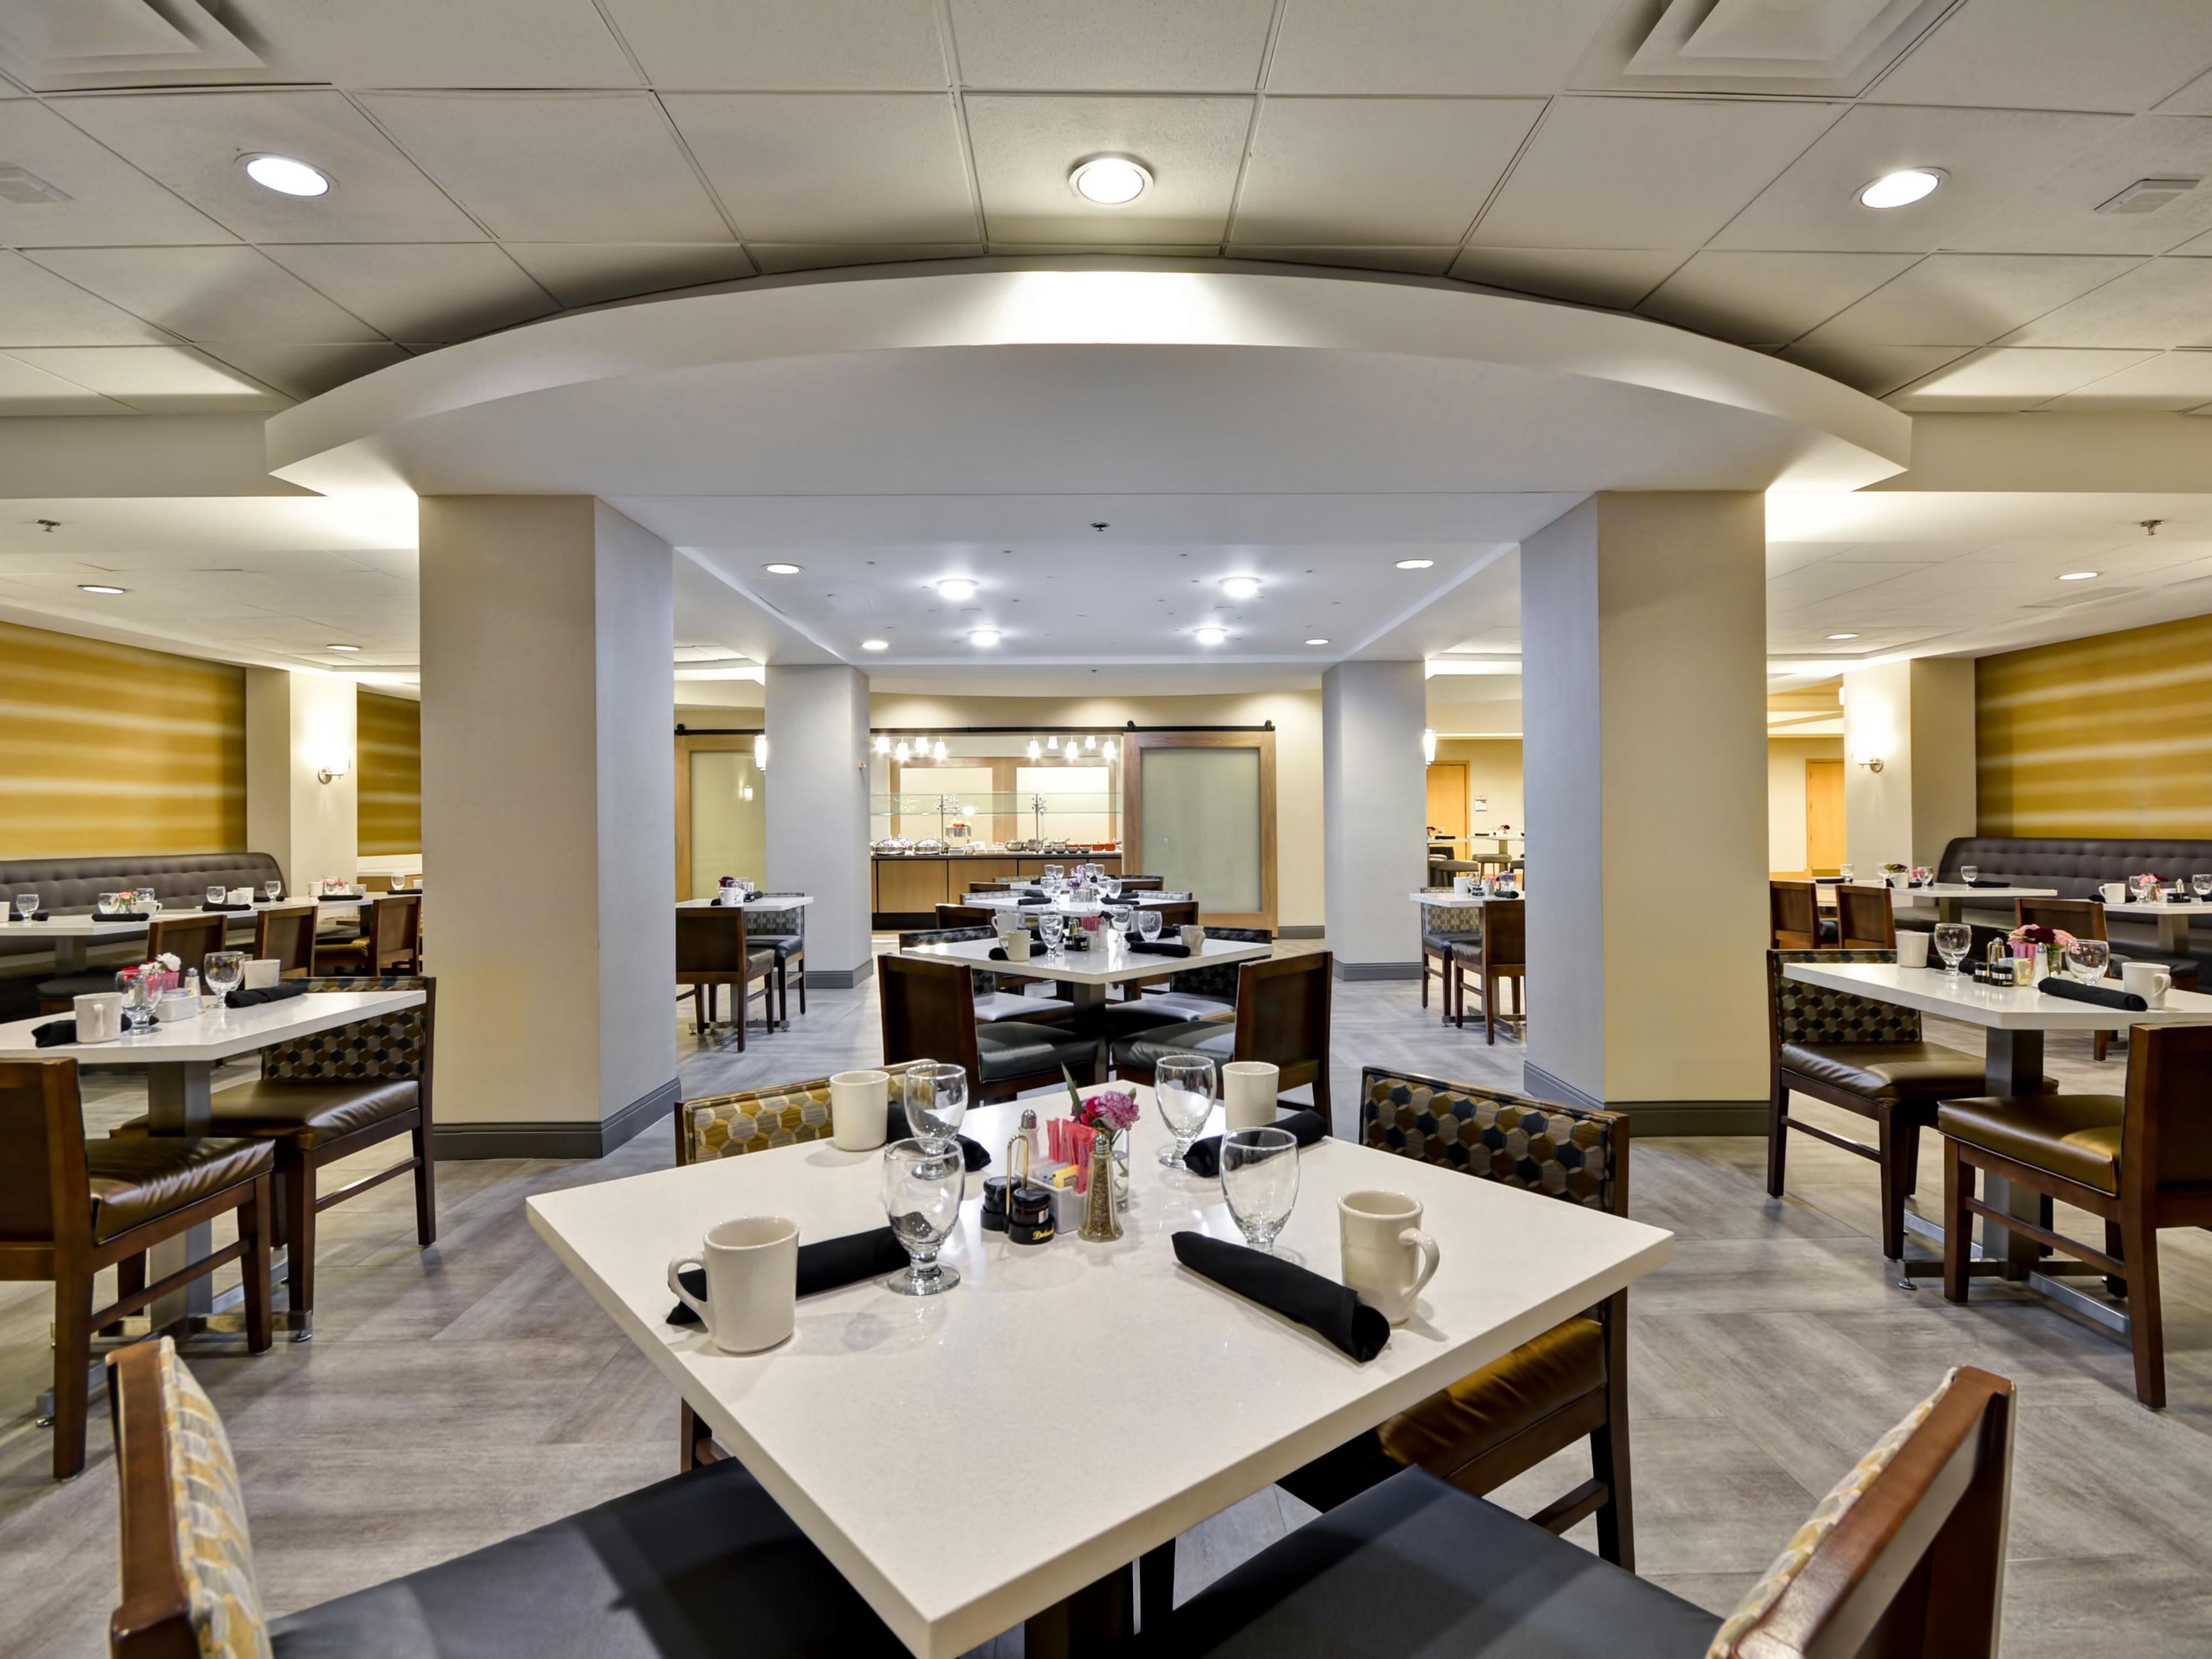 img interior residential ok tulsa i huntington commercial design yorktown d